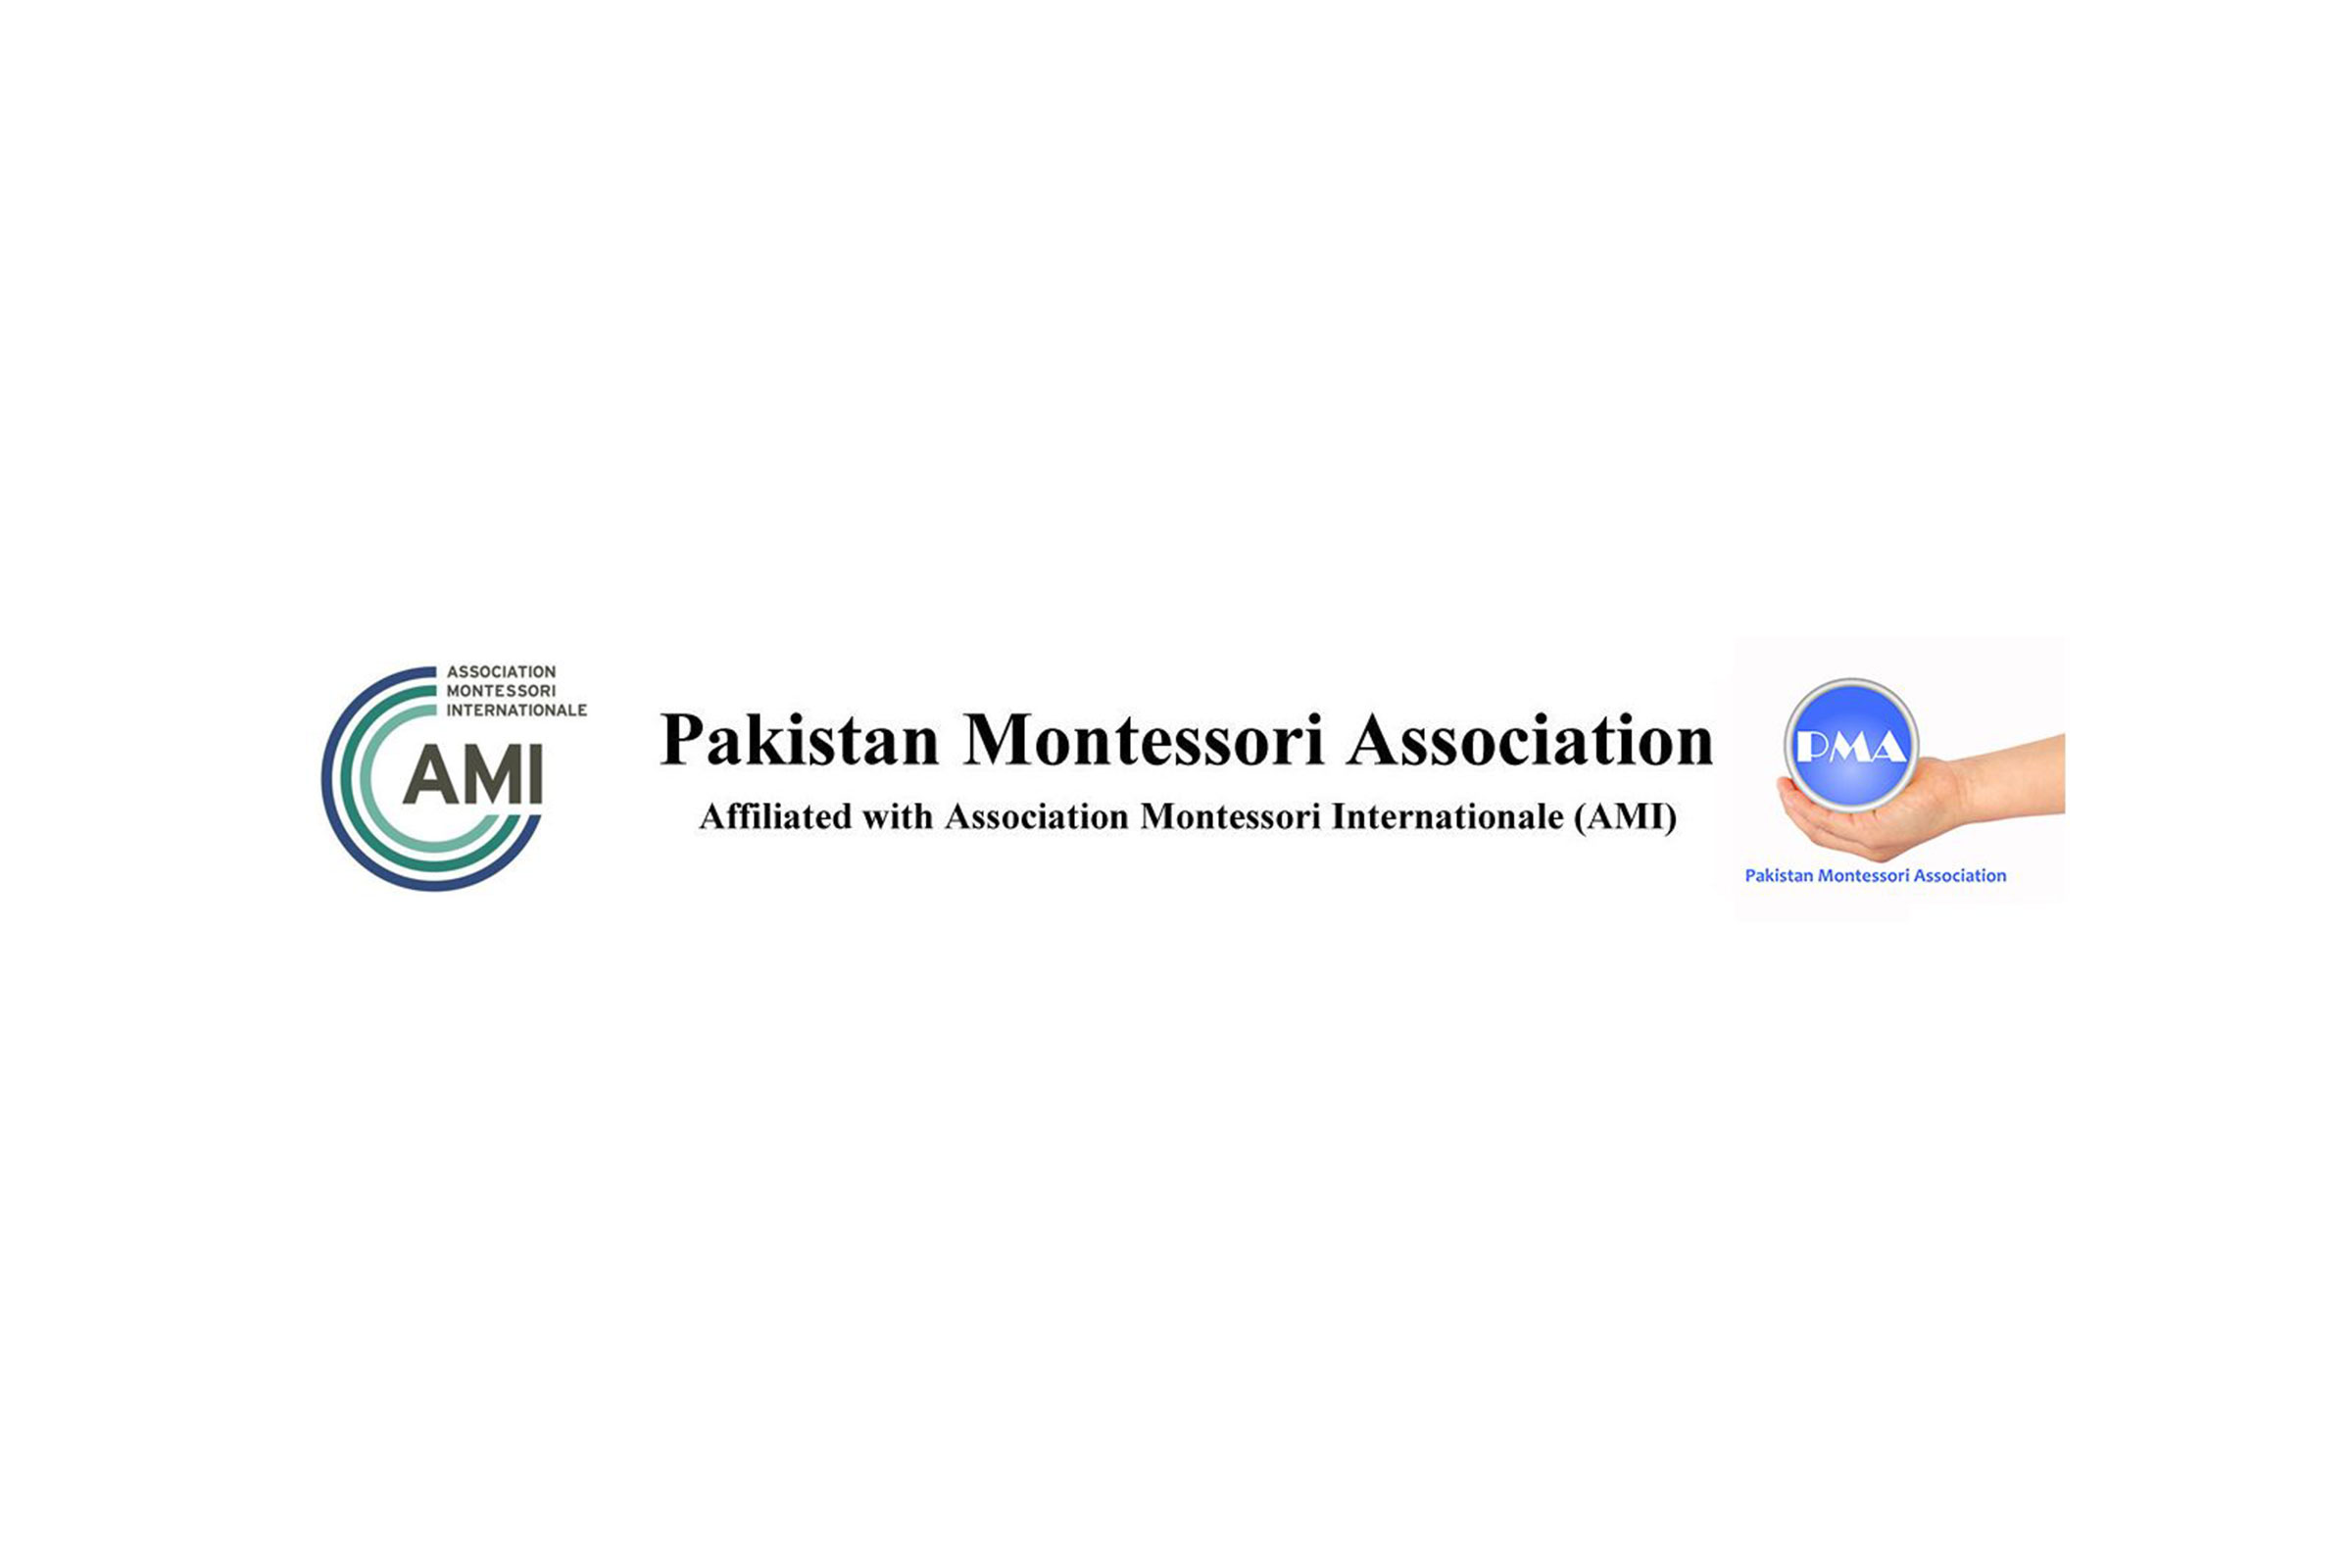 The Pakistan Montessori Association logo